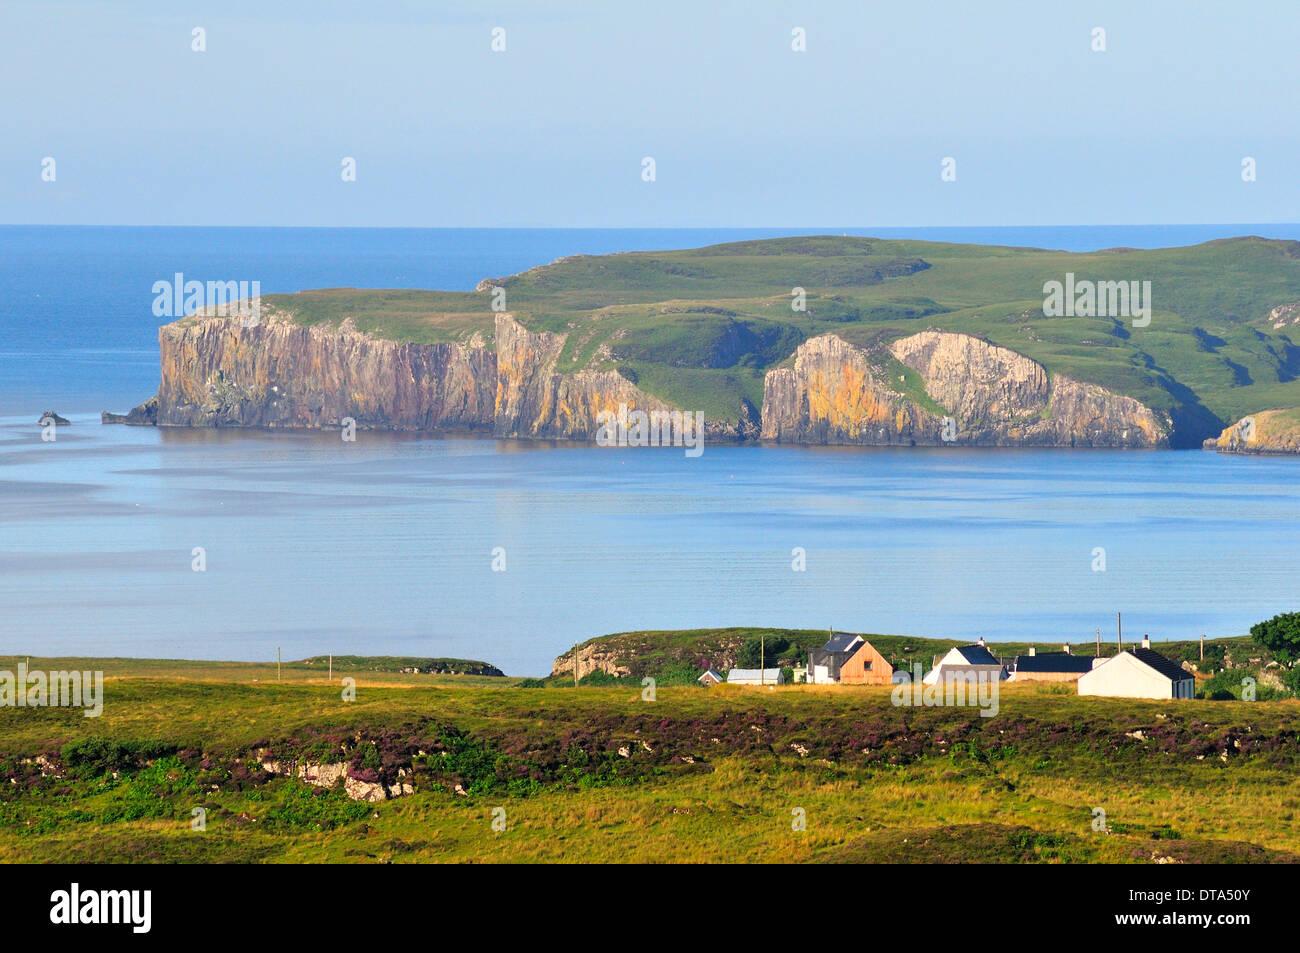 Loch Bracadale, Ross, Skye and Lochaber, Isle of Skye, Scotland, United Kingdom - Stock Image